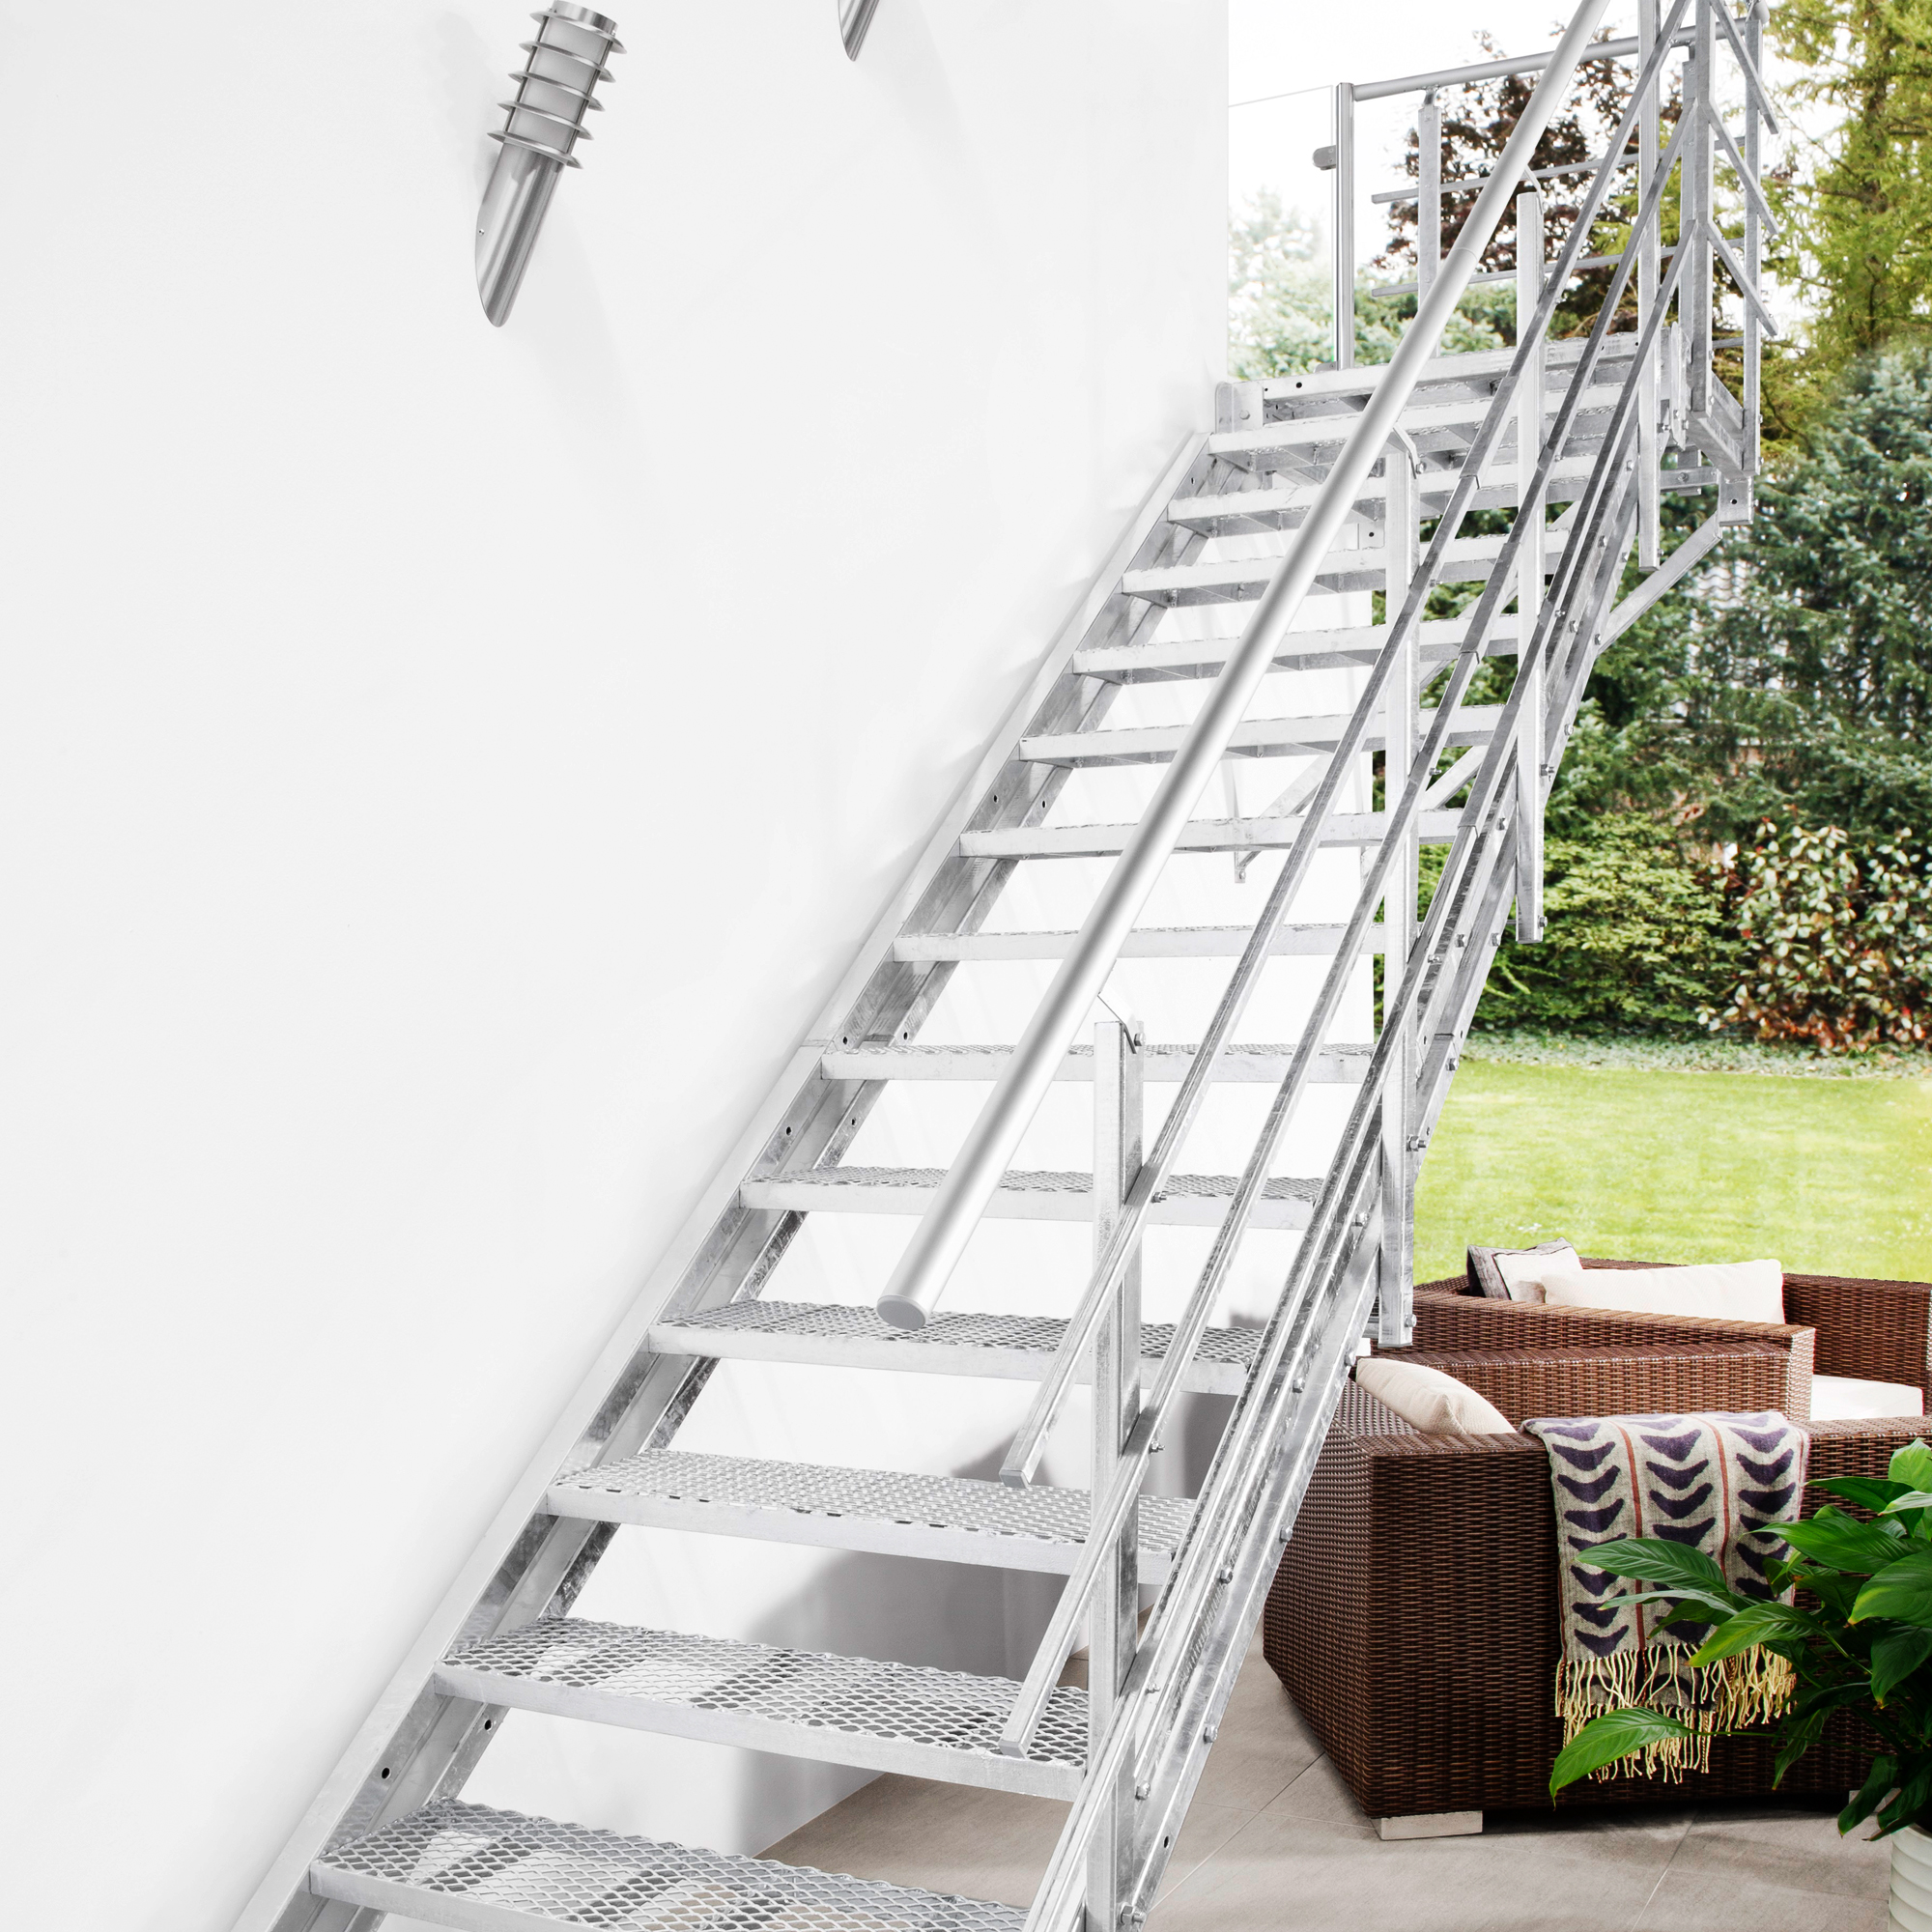 au entreppe aus stahl verzinkt mit podest hier kaufen. Black Bedroom Furniture Sets. Home Design Ideas